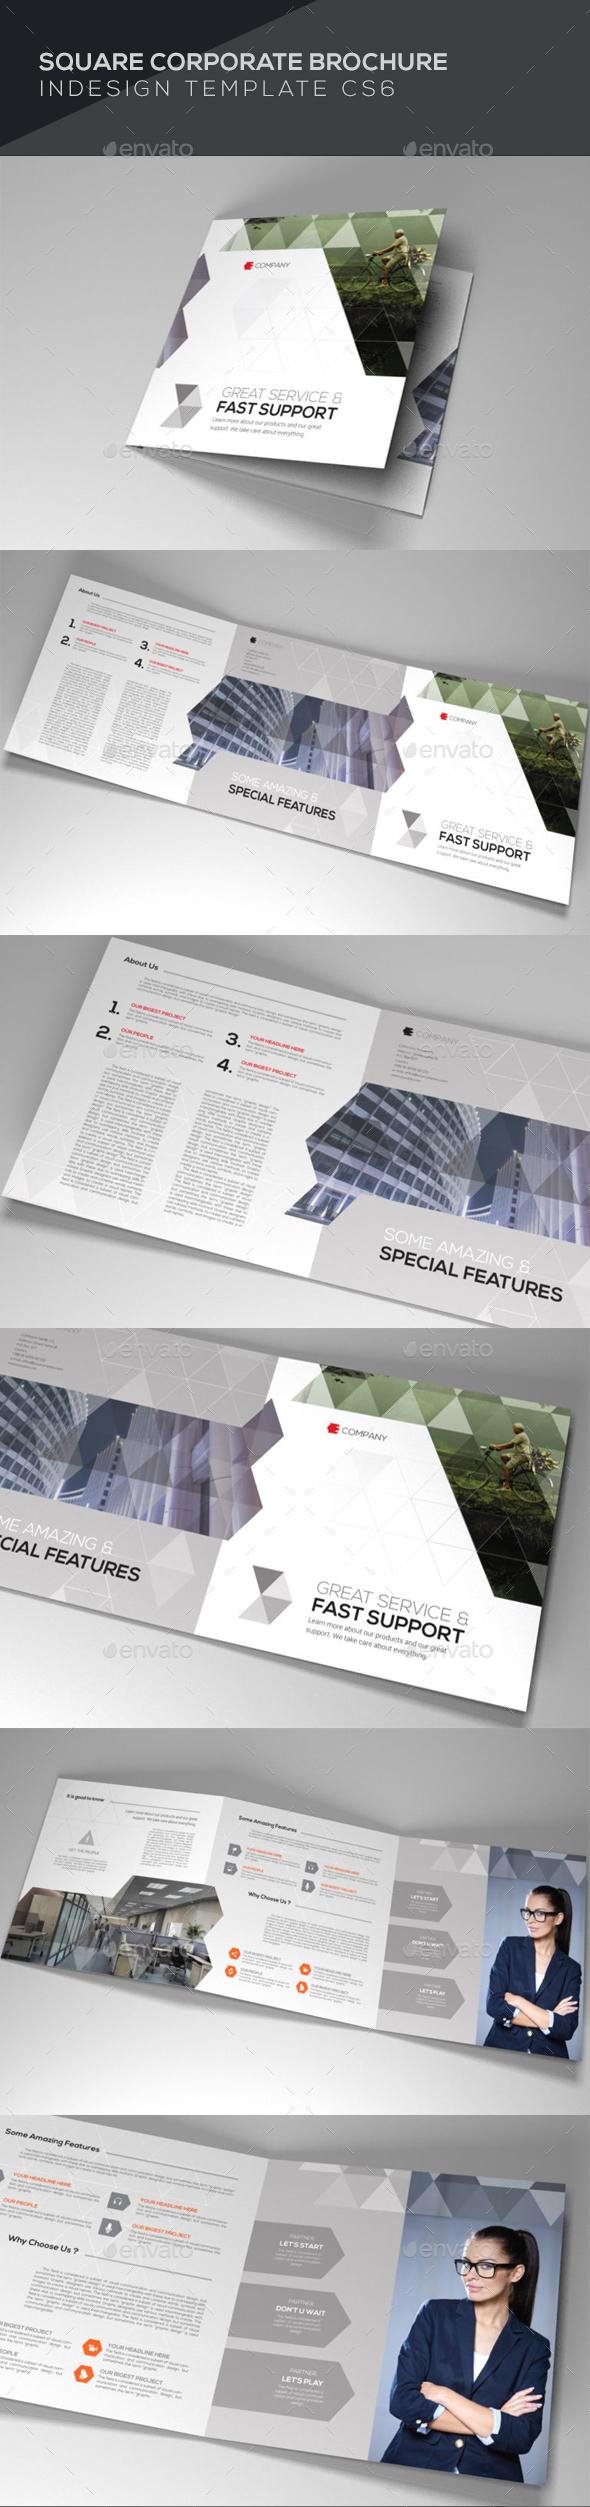 Square Corporate Brochure - Brochures Print Templates